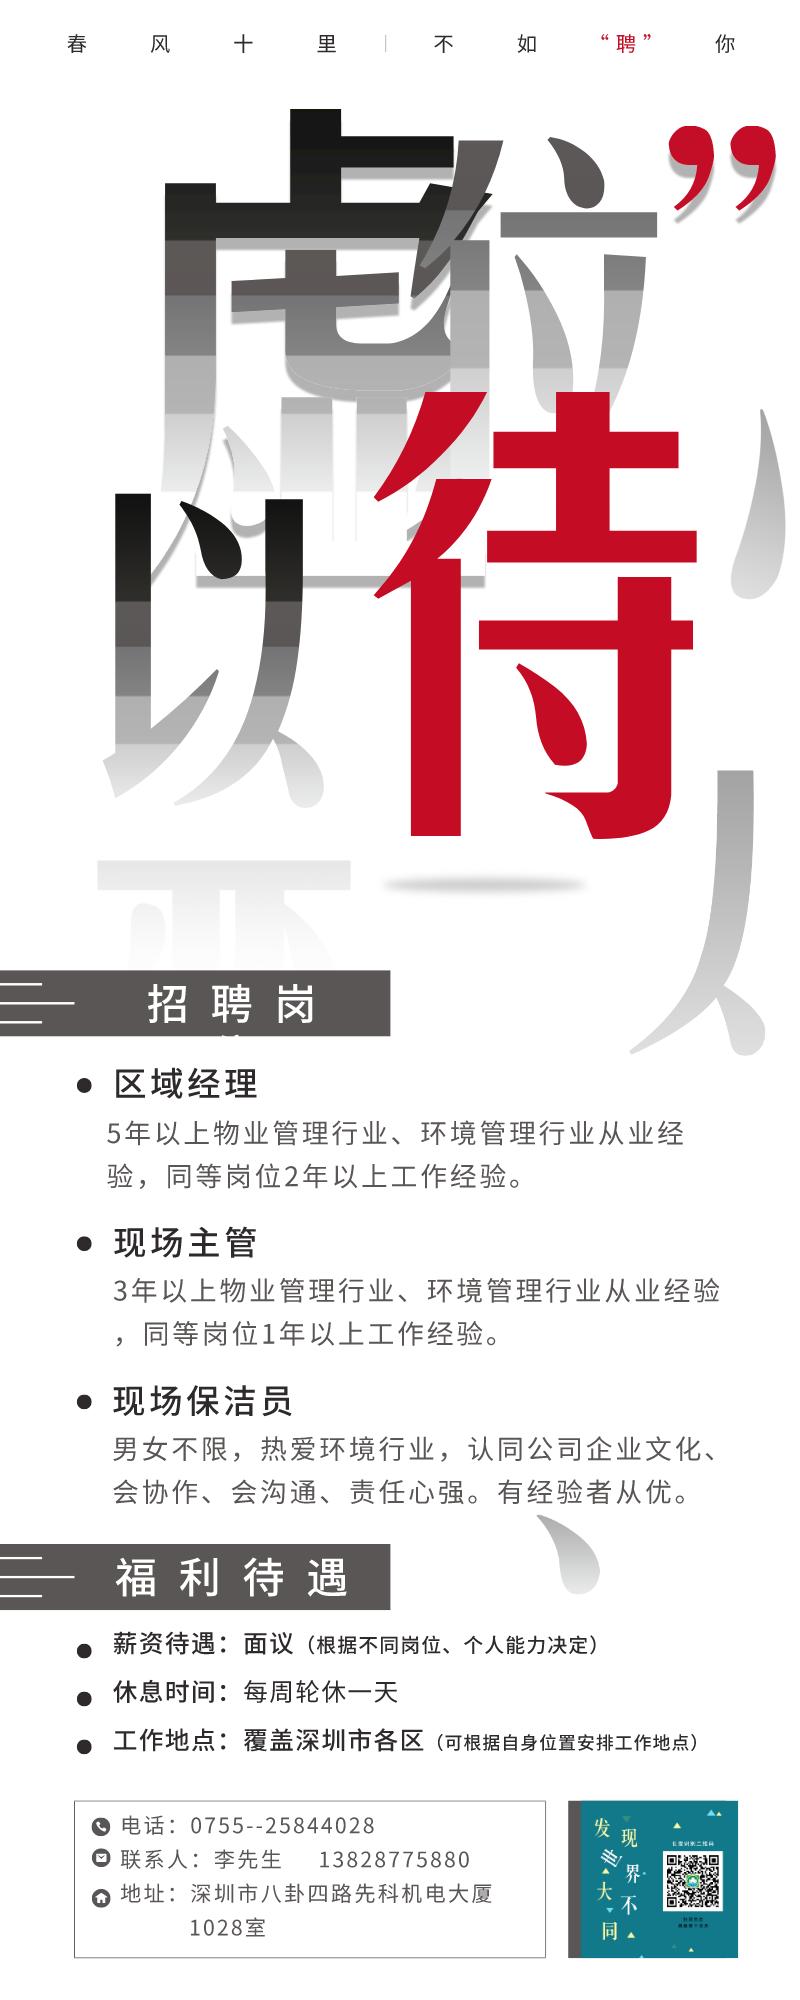 招聘(3岗).png